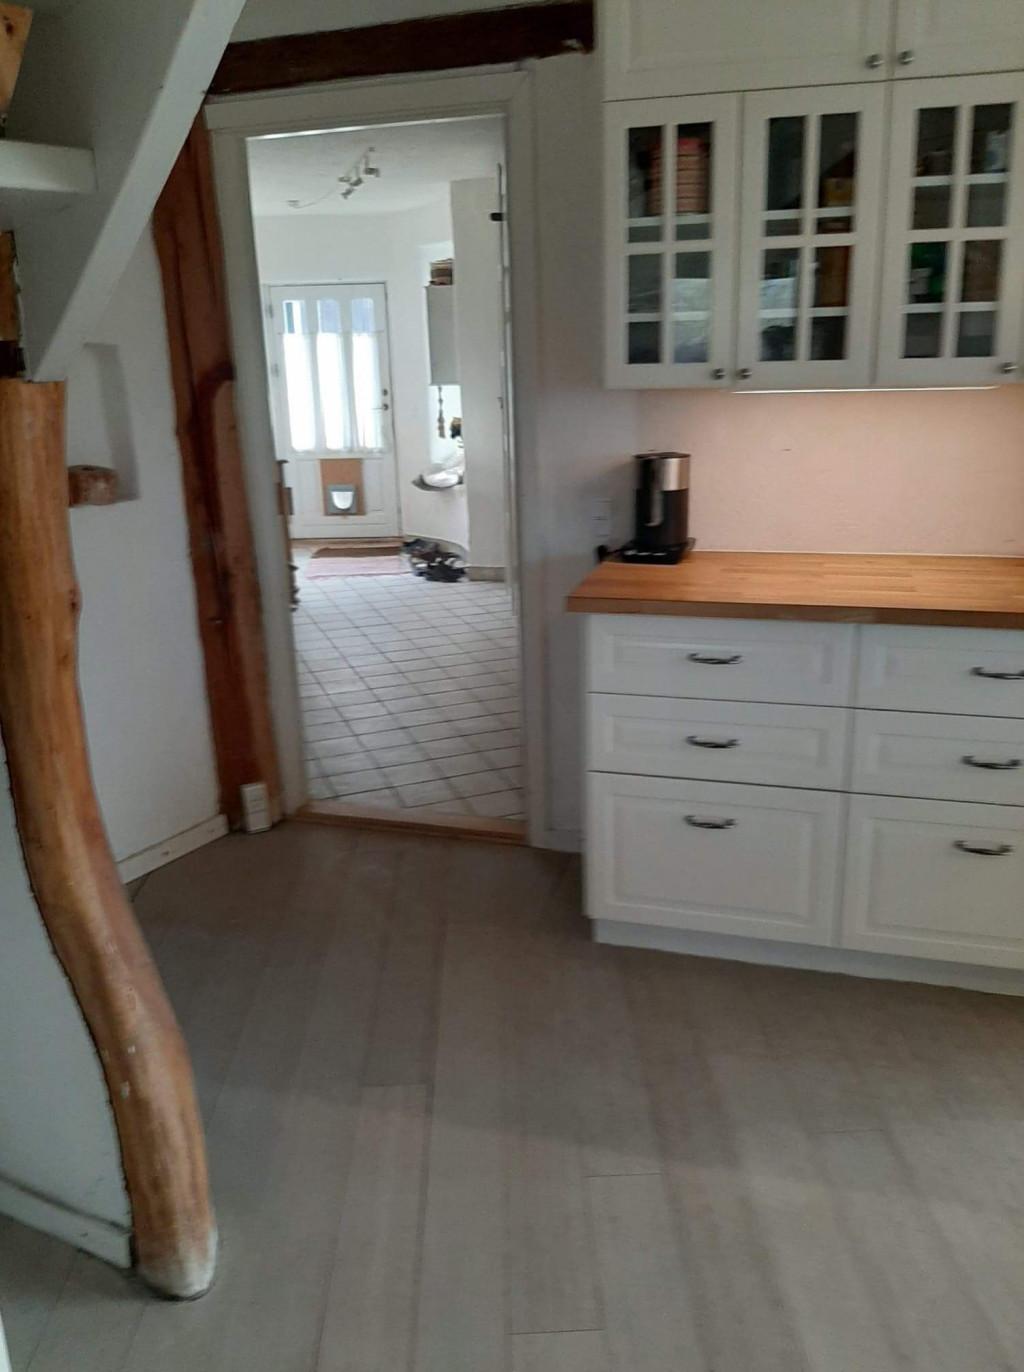 Unik villa til salg i Økolandsbyen Hallingelille - husfoto6_df0ec90b6b5509c439285ae8b5f48e52